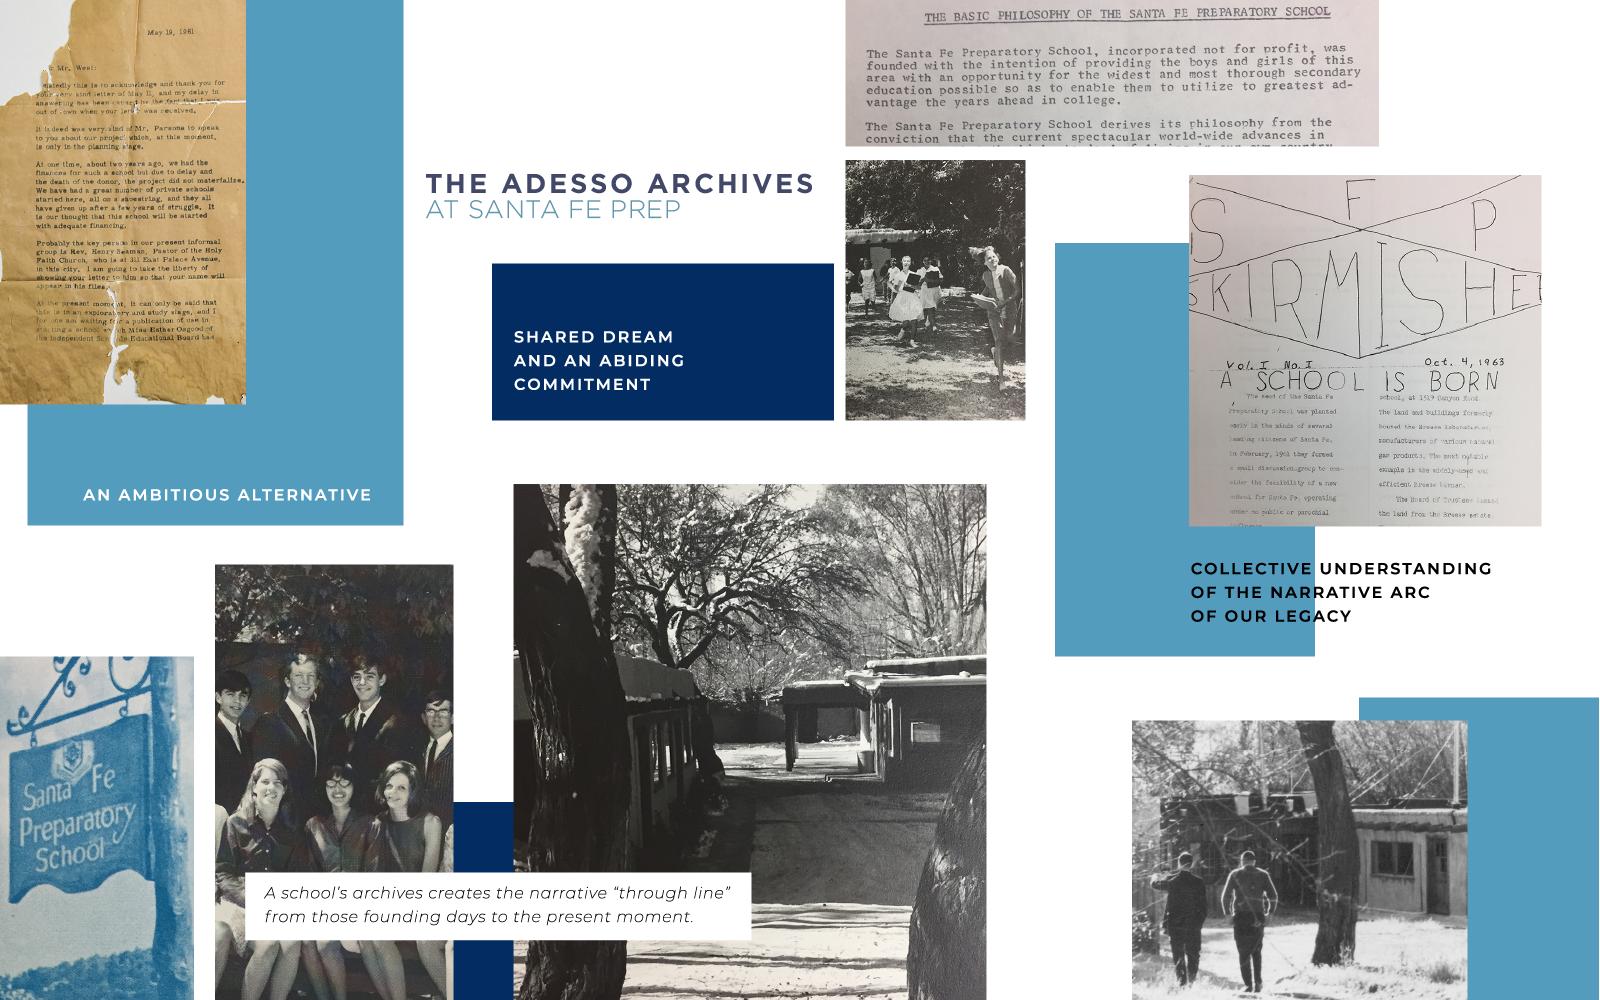 Join Santa Fe Prep to Establish The Adesso Archives image